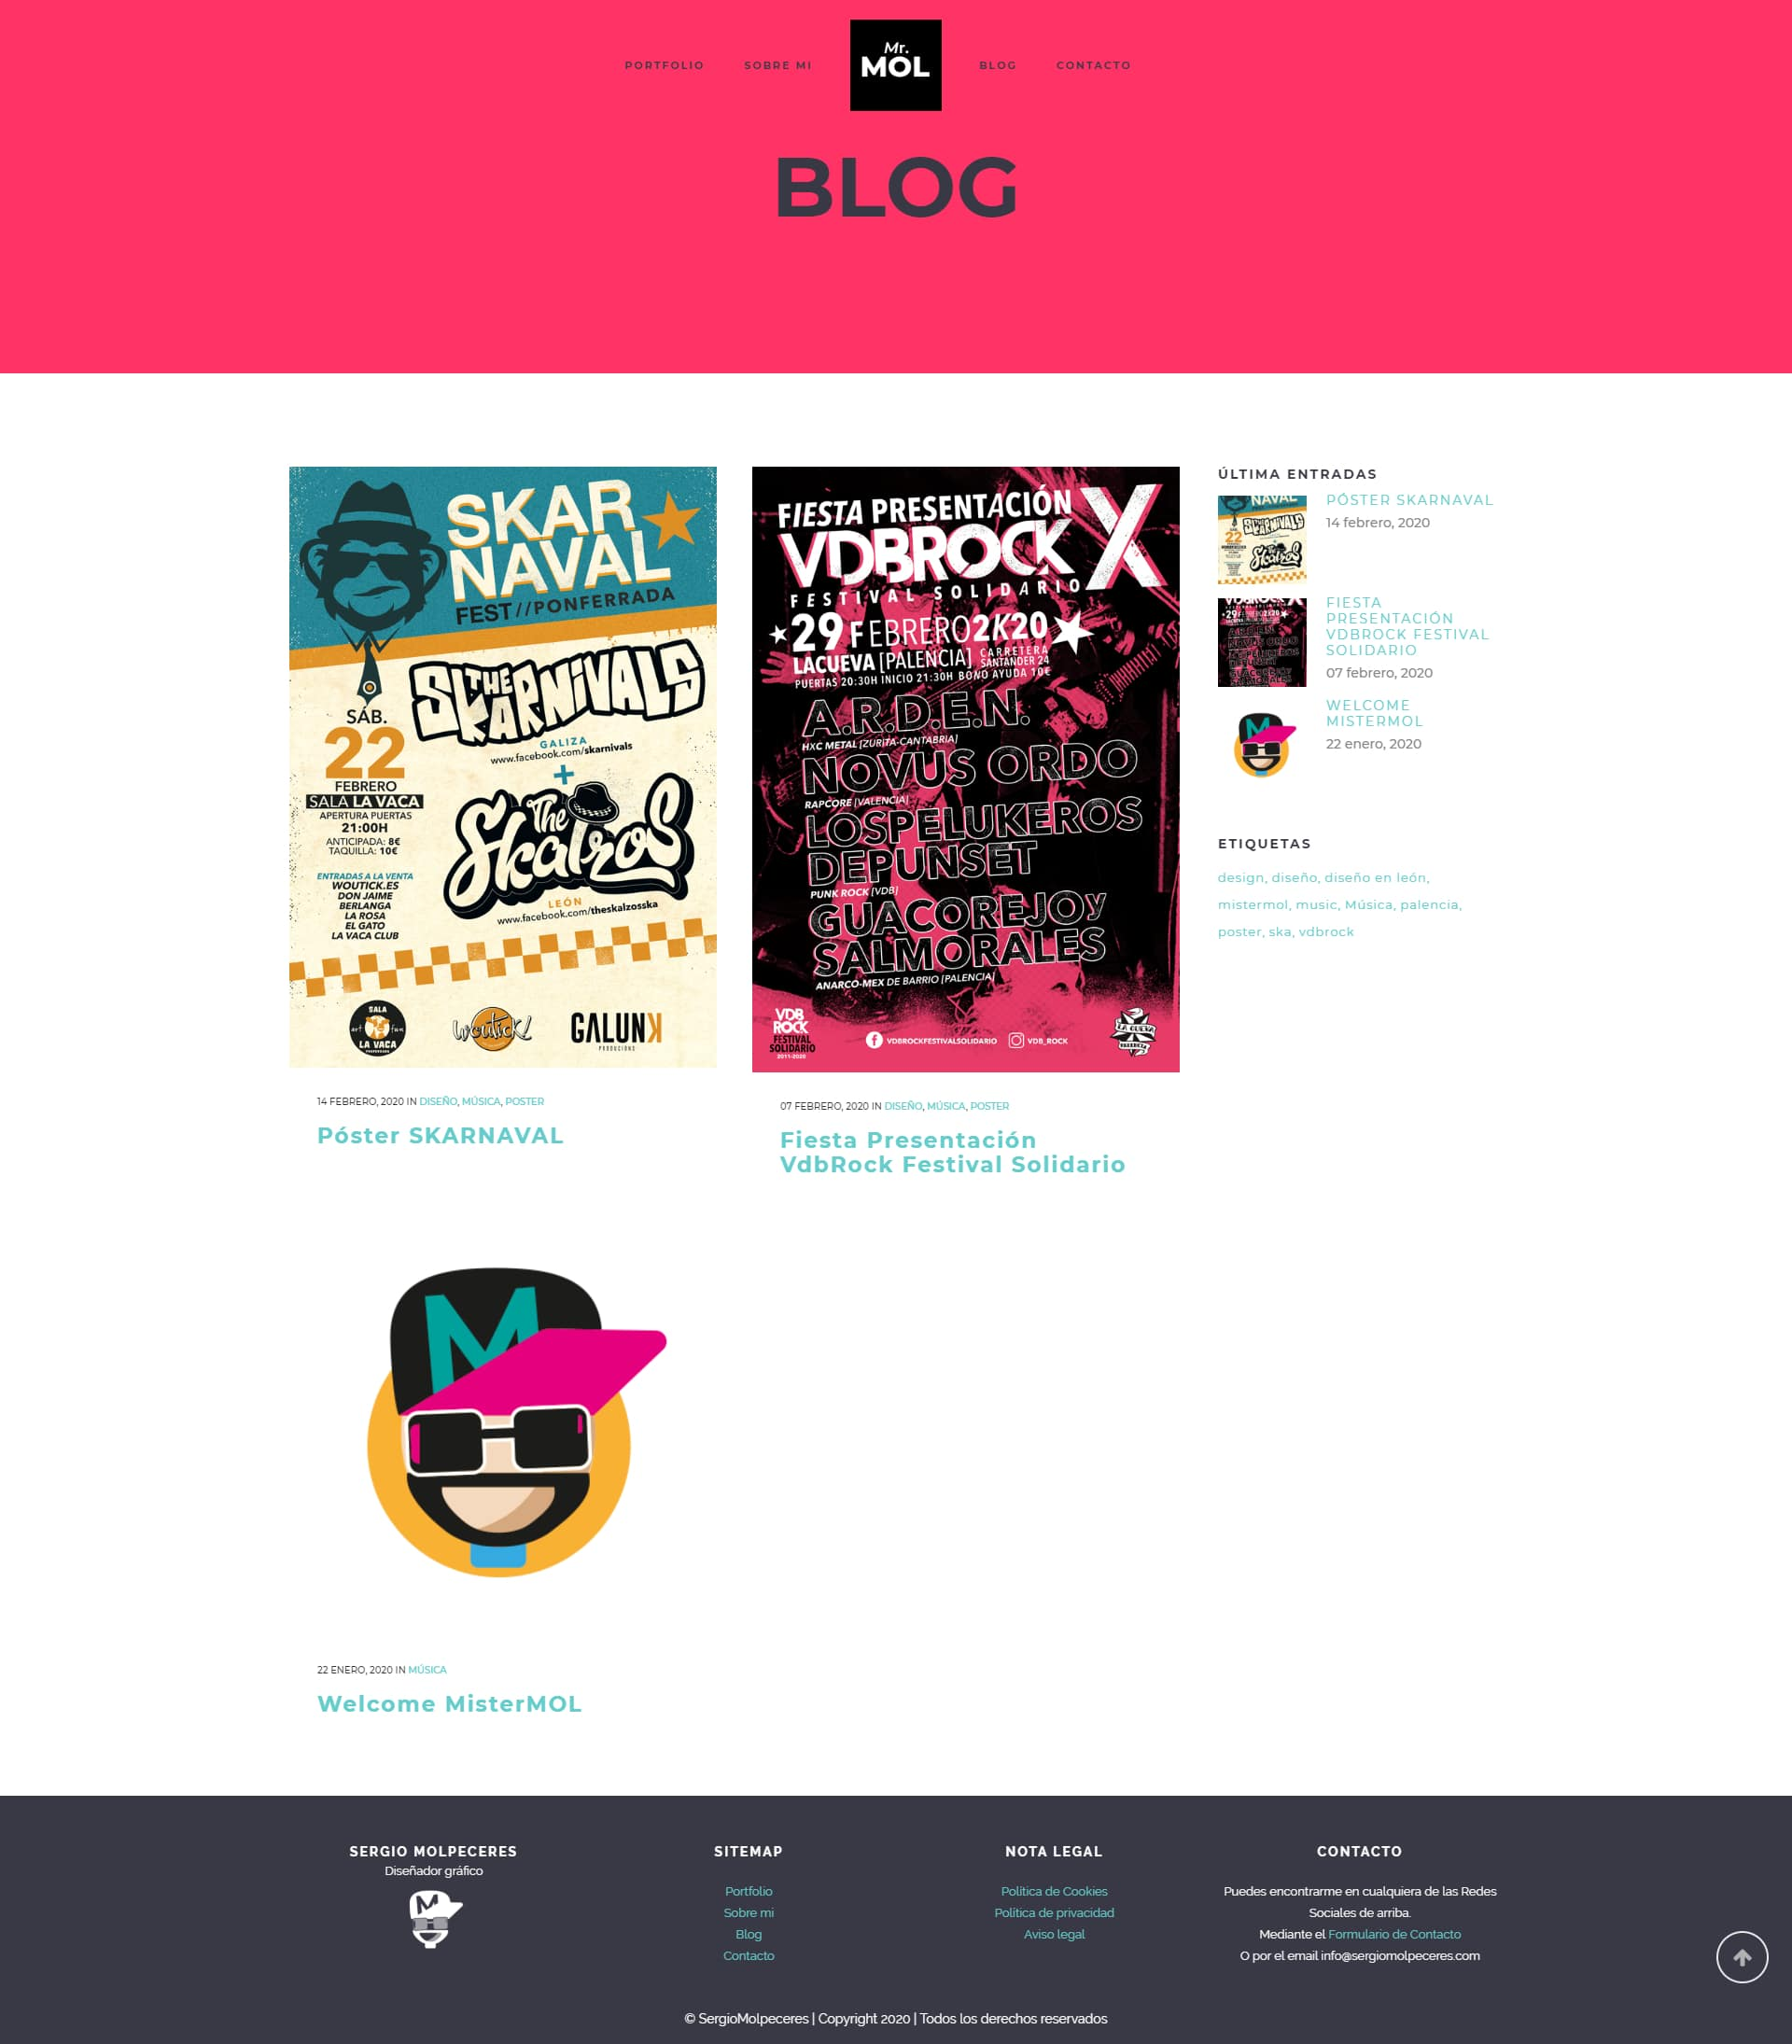 Molp blog